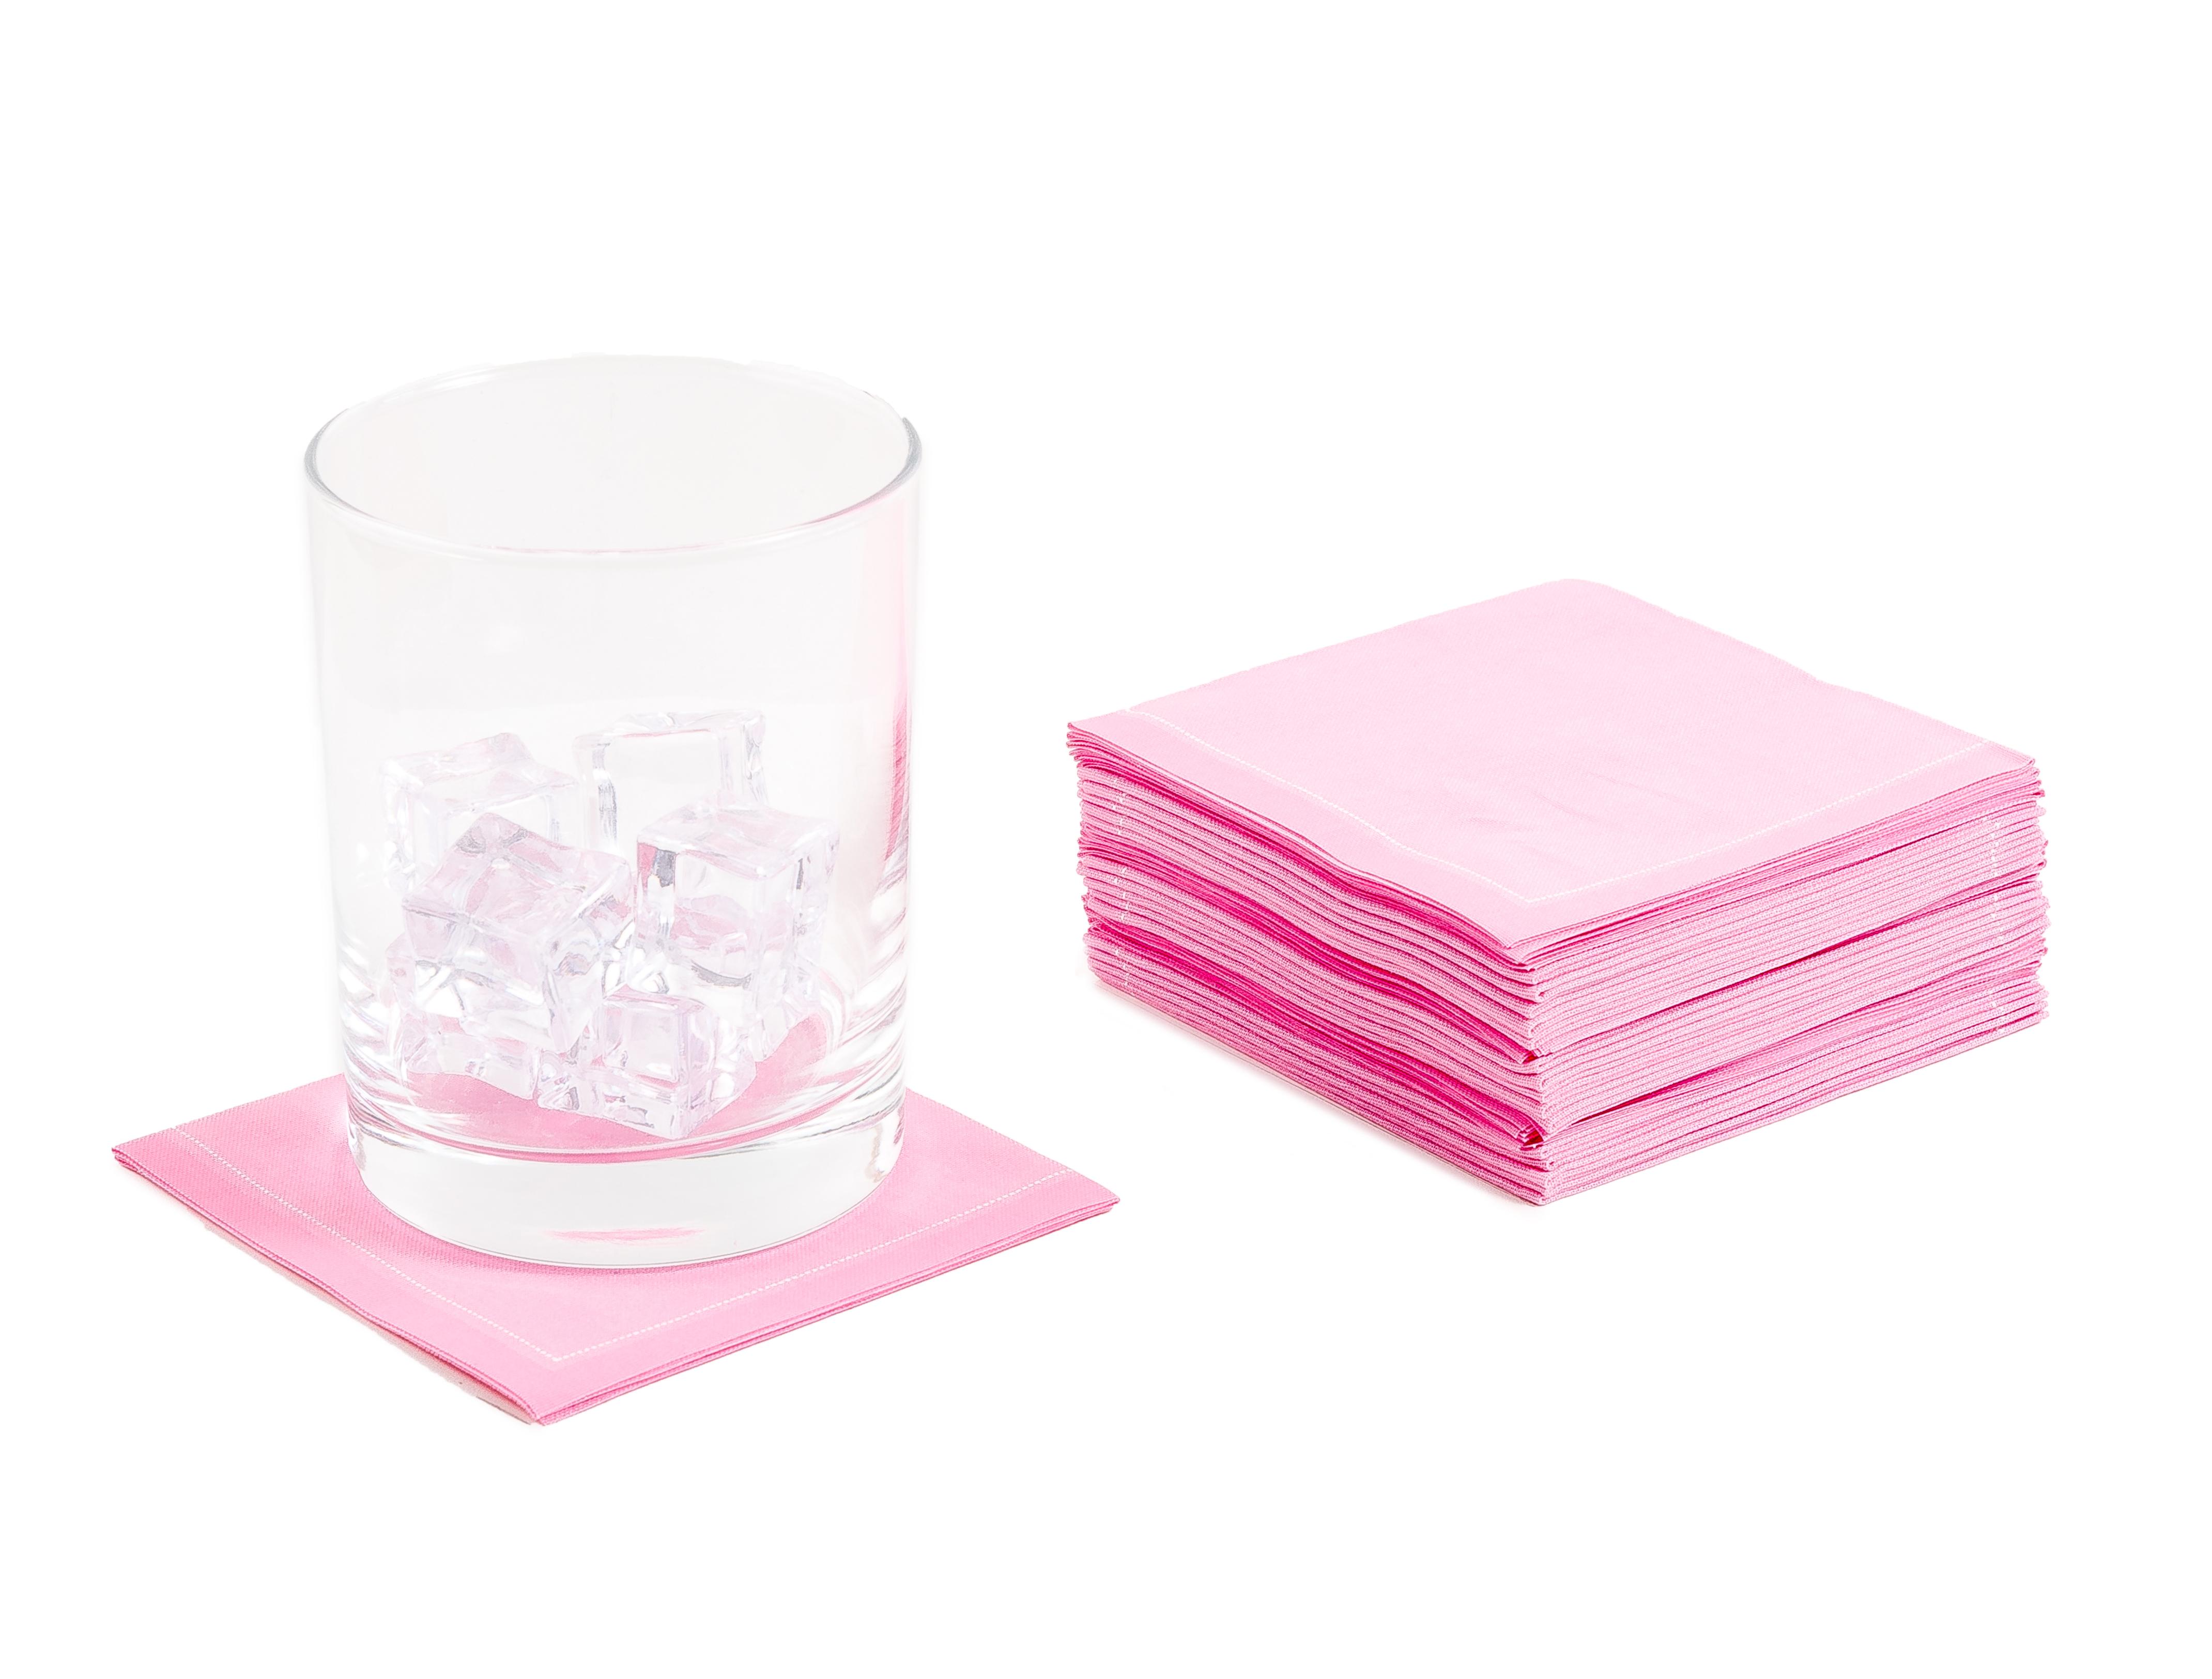 "Rose Cotton 1/4 Fold Cocktail - 8"" x 8"" (folded 4"" x 4"") - 30 units"